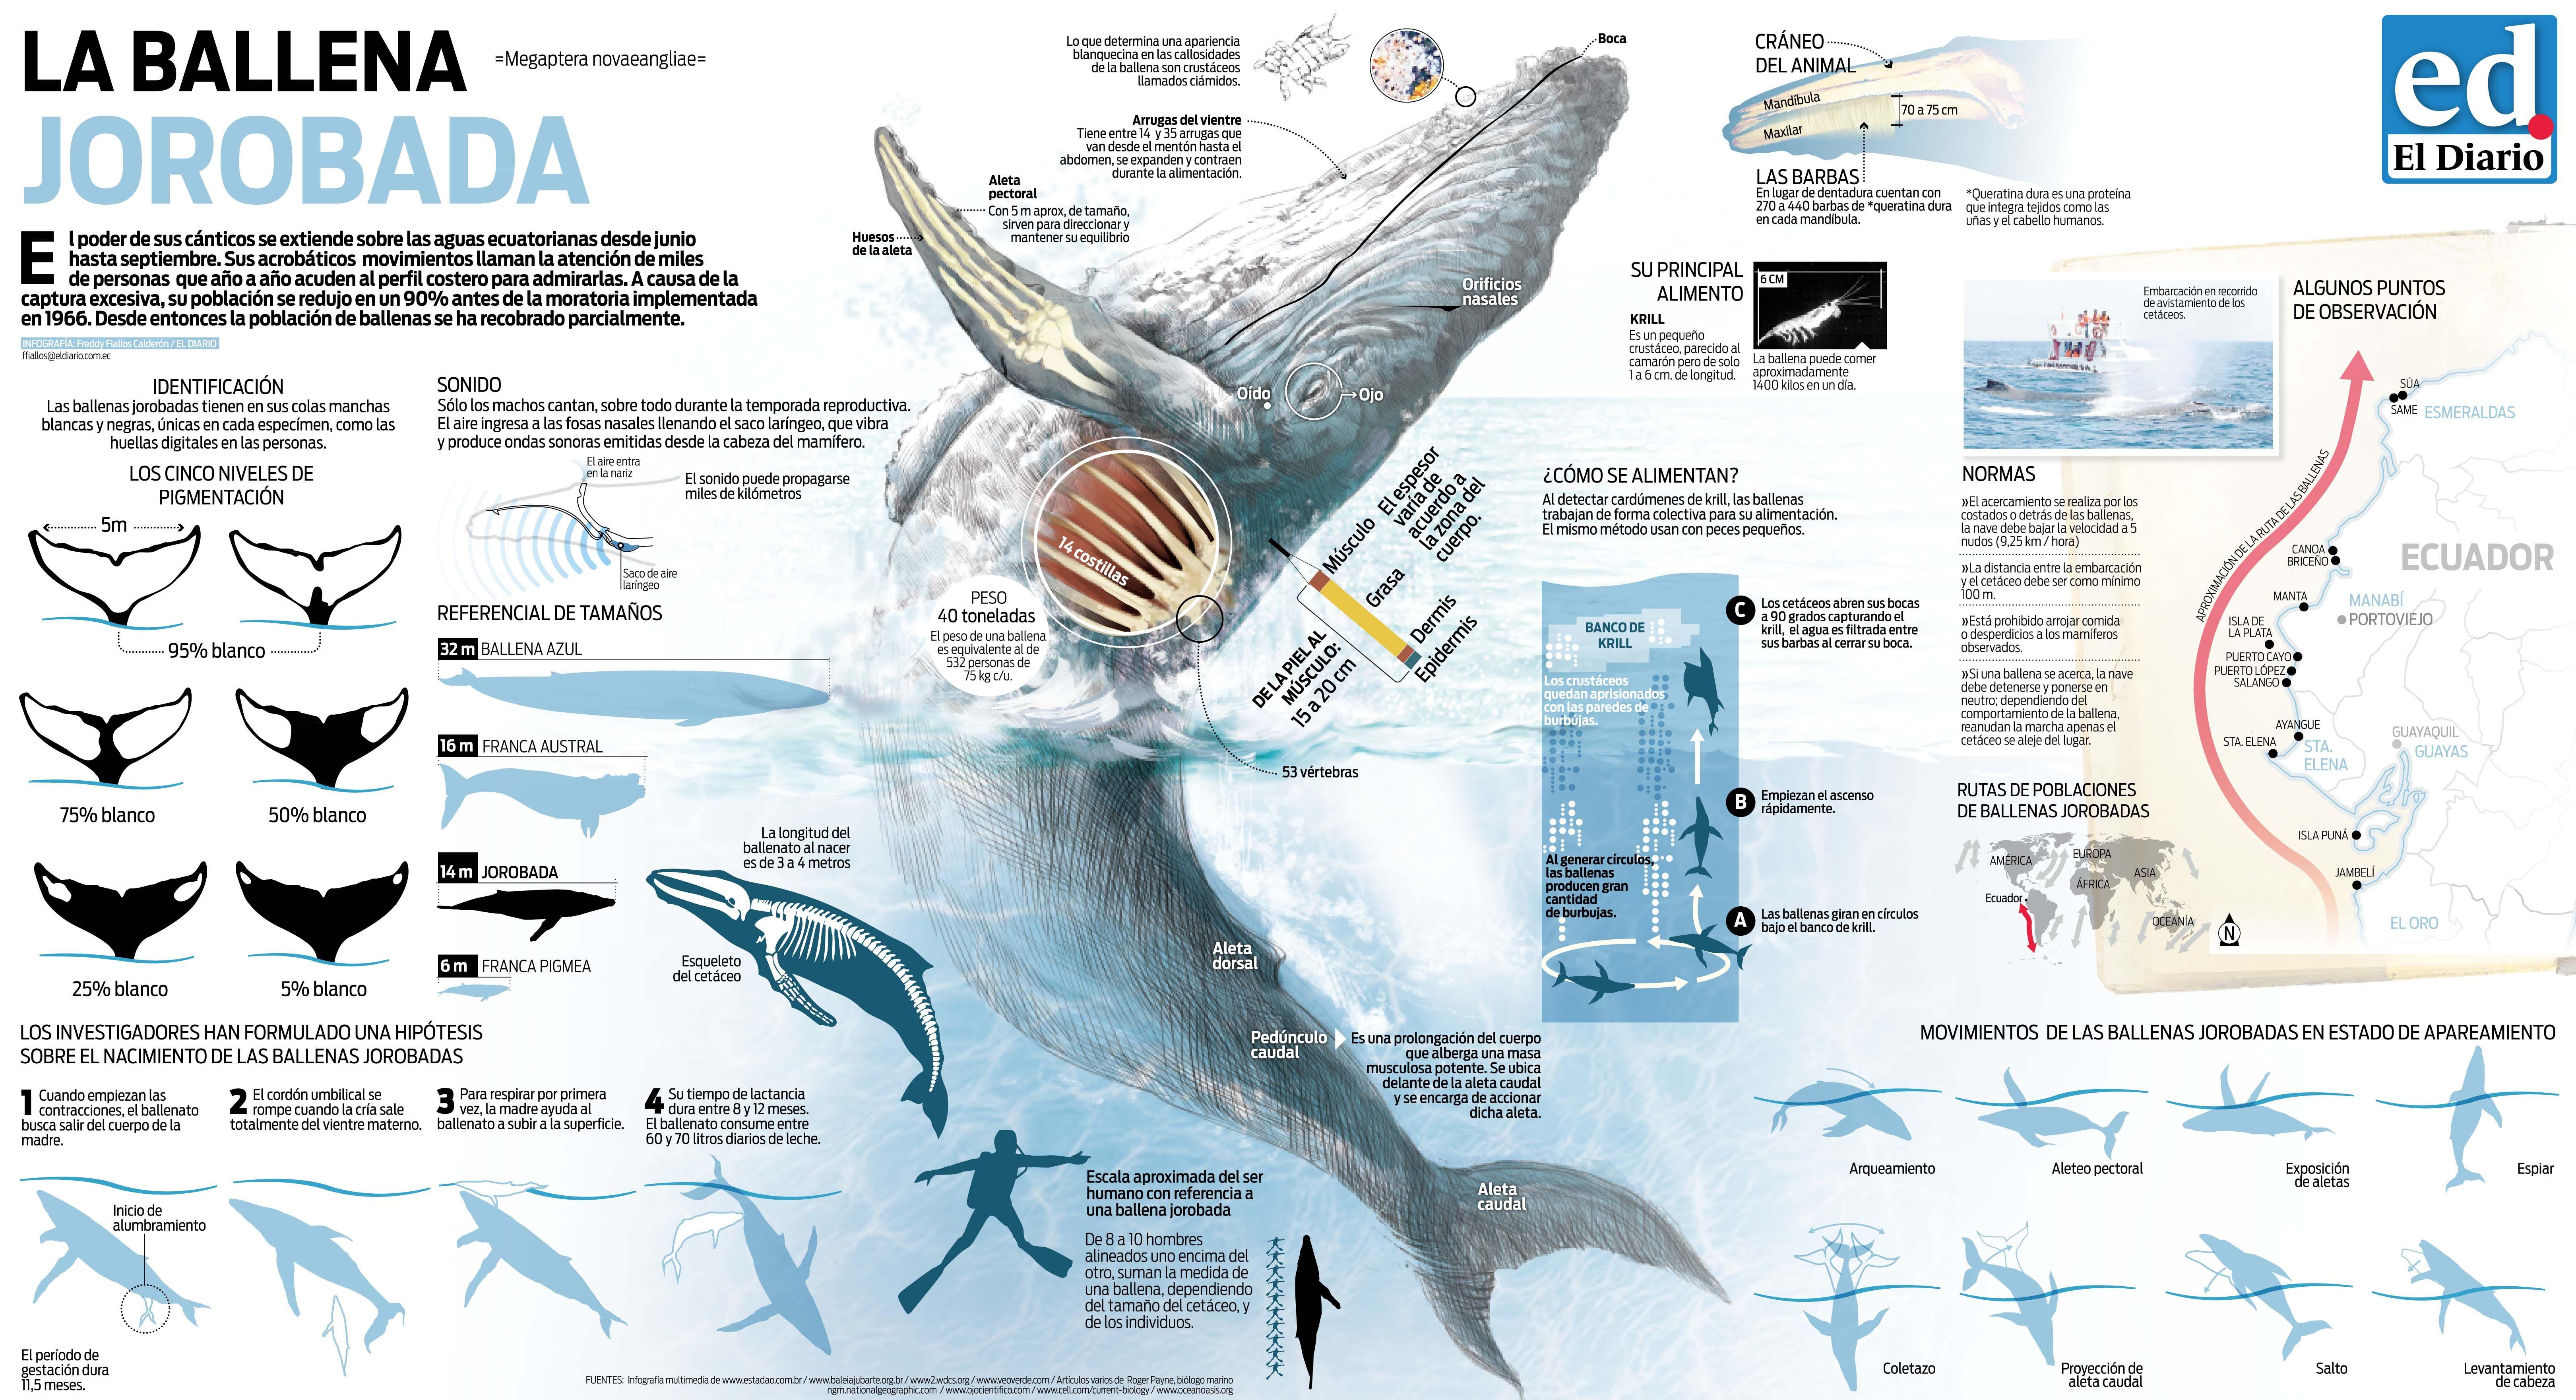 ballena jorobada - Buscar con Google   Animales   Pinterest ...